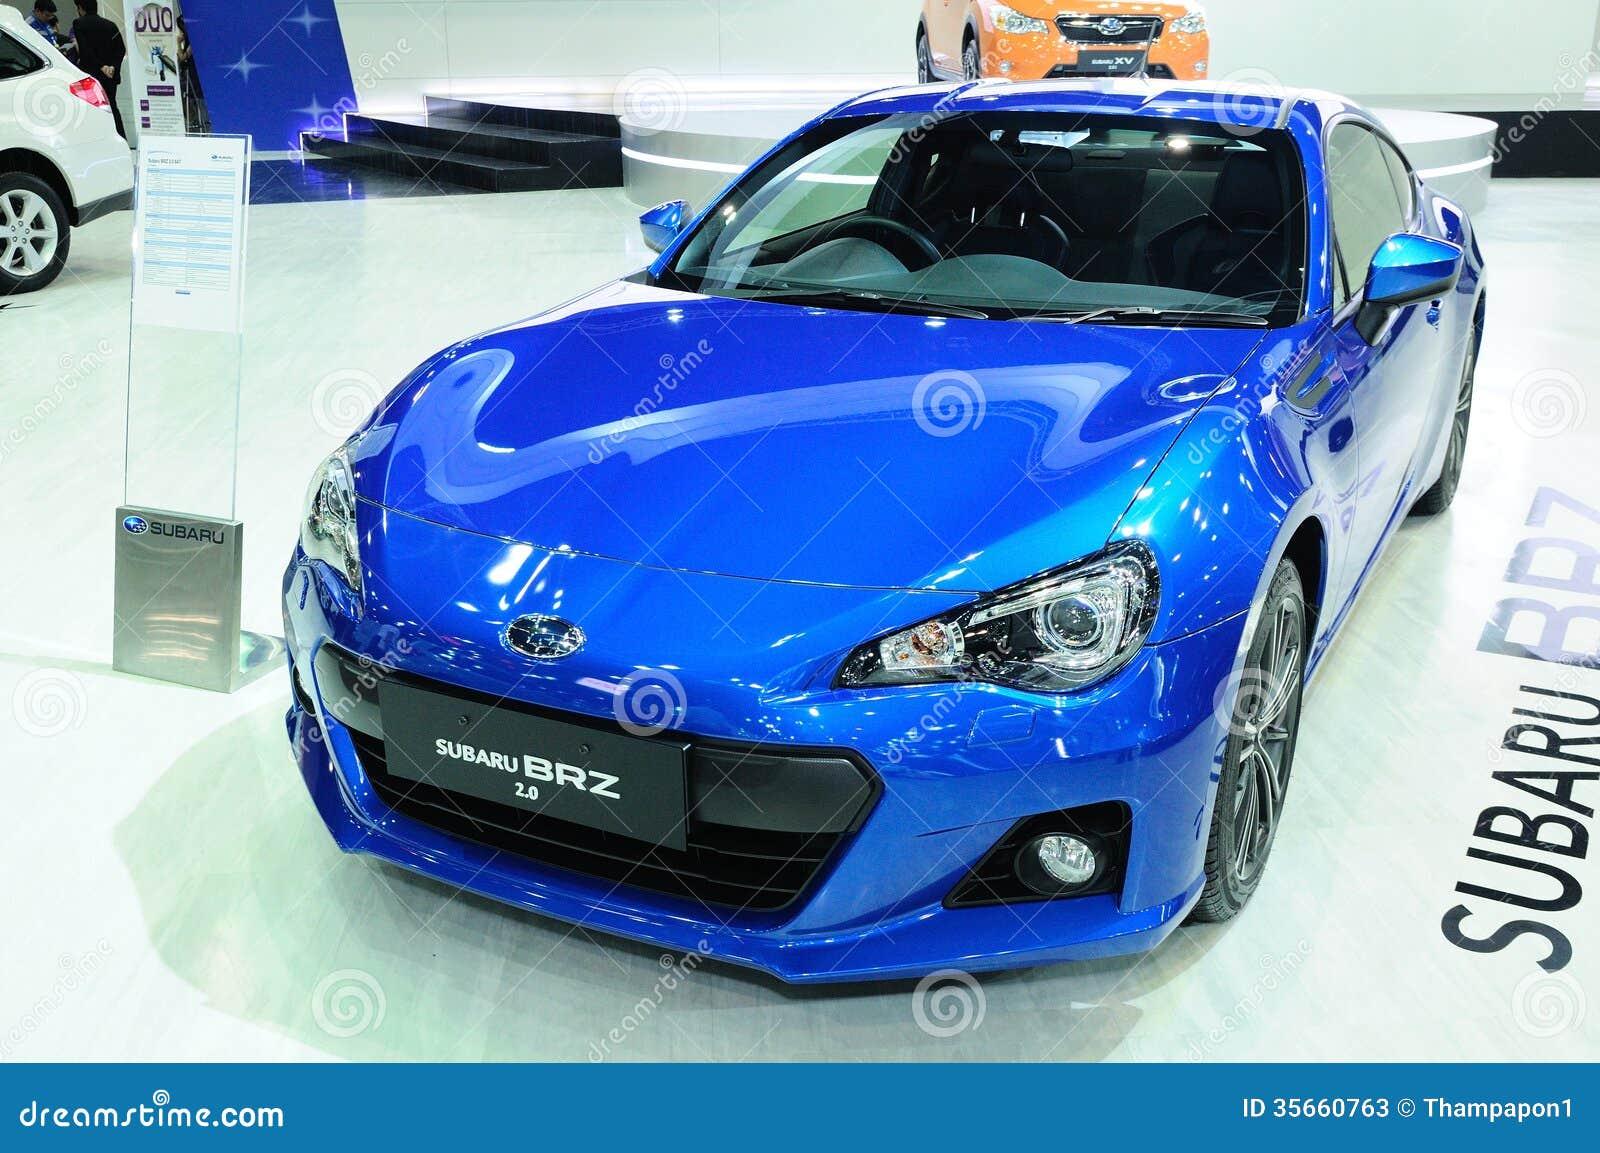 Bkk Nov 28 Subaru Brz 2 0i Supercar Or Sport Car On Display